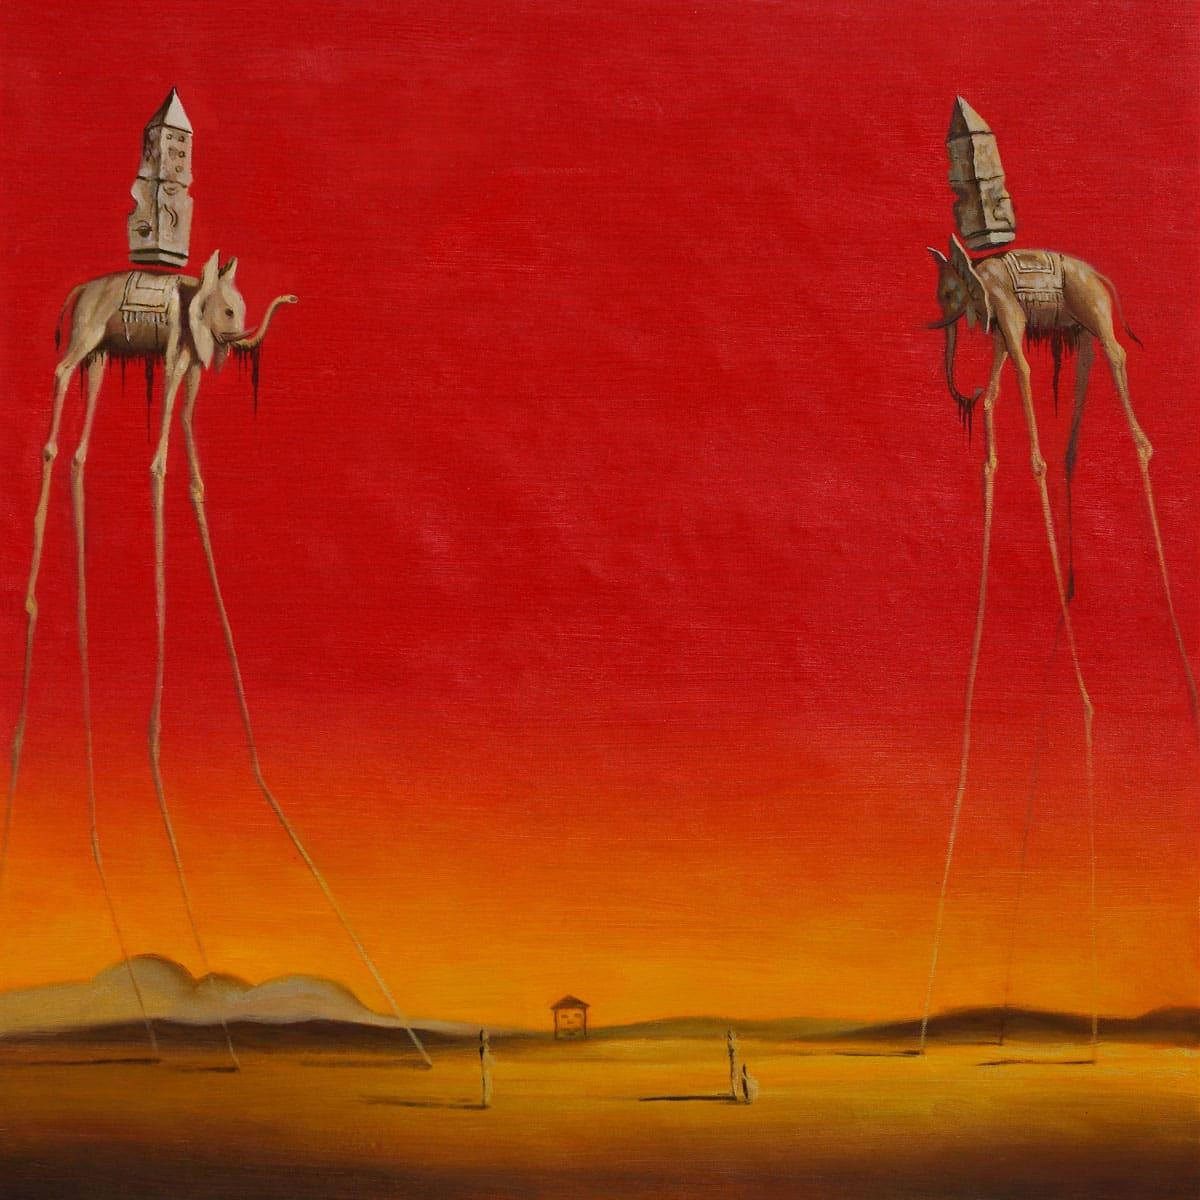 The Shameful Life of Salvador Dali.